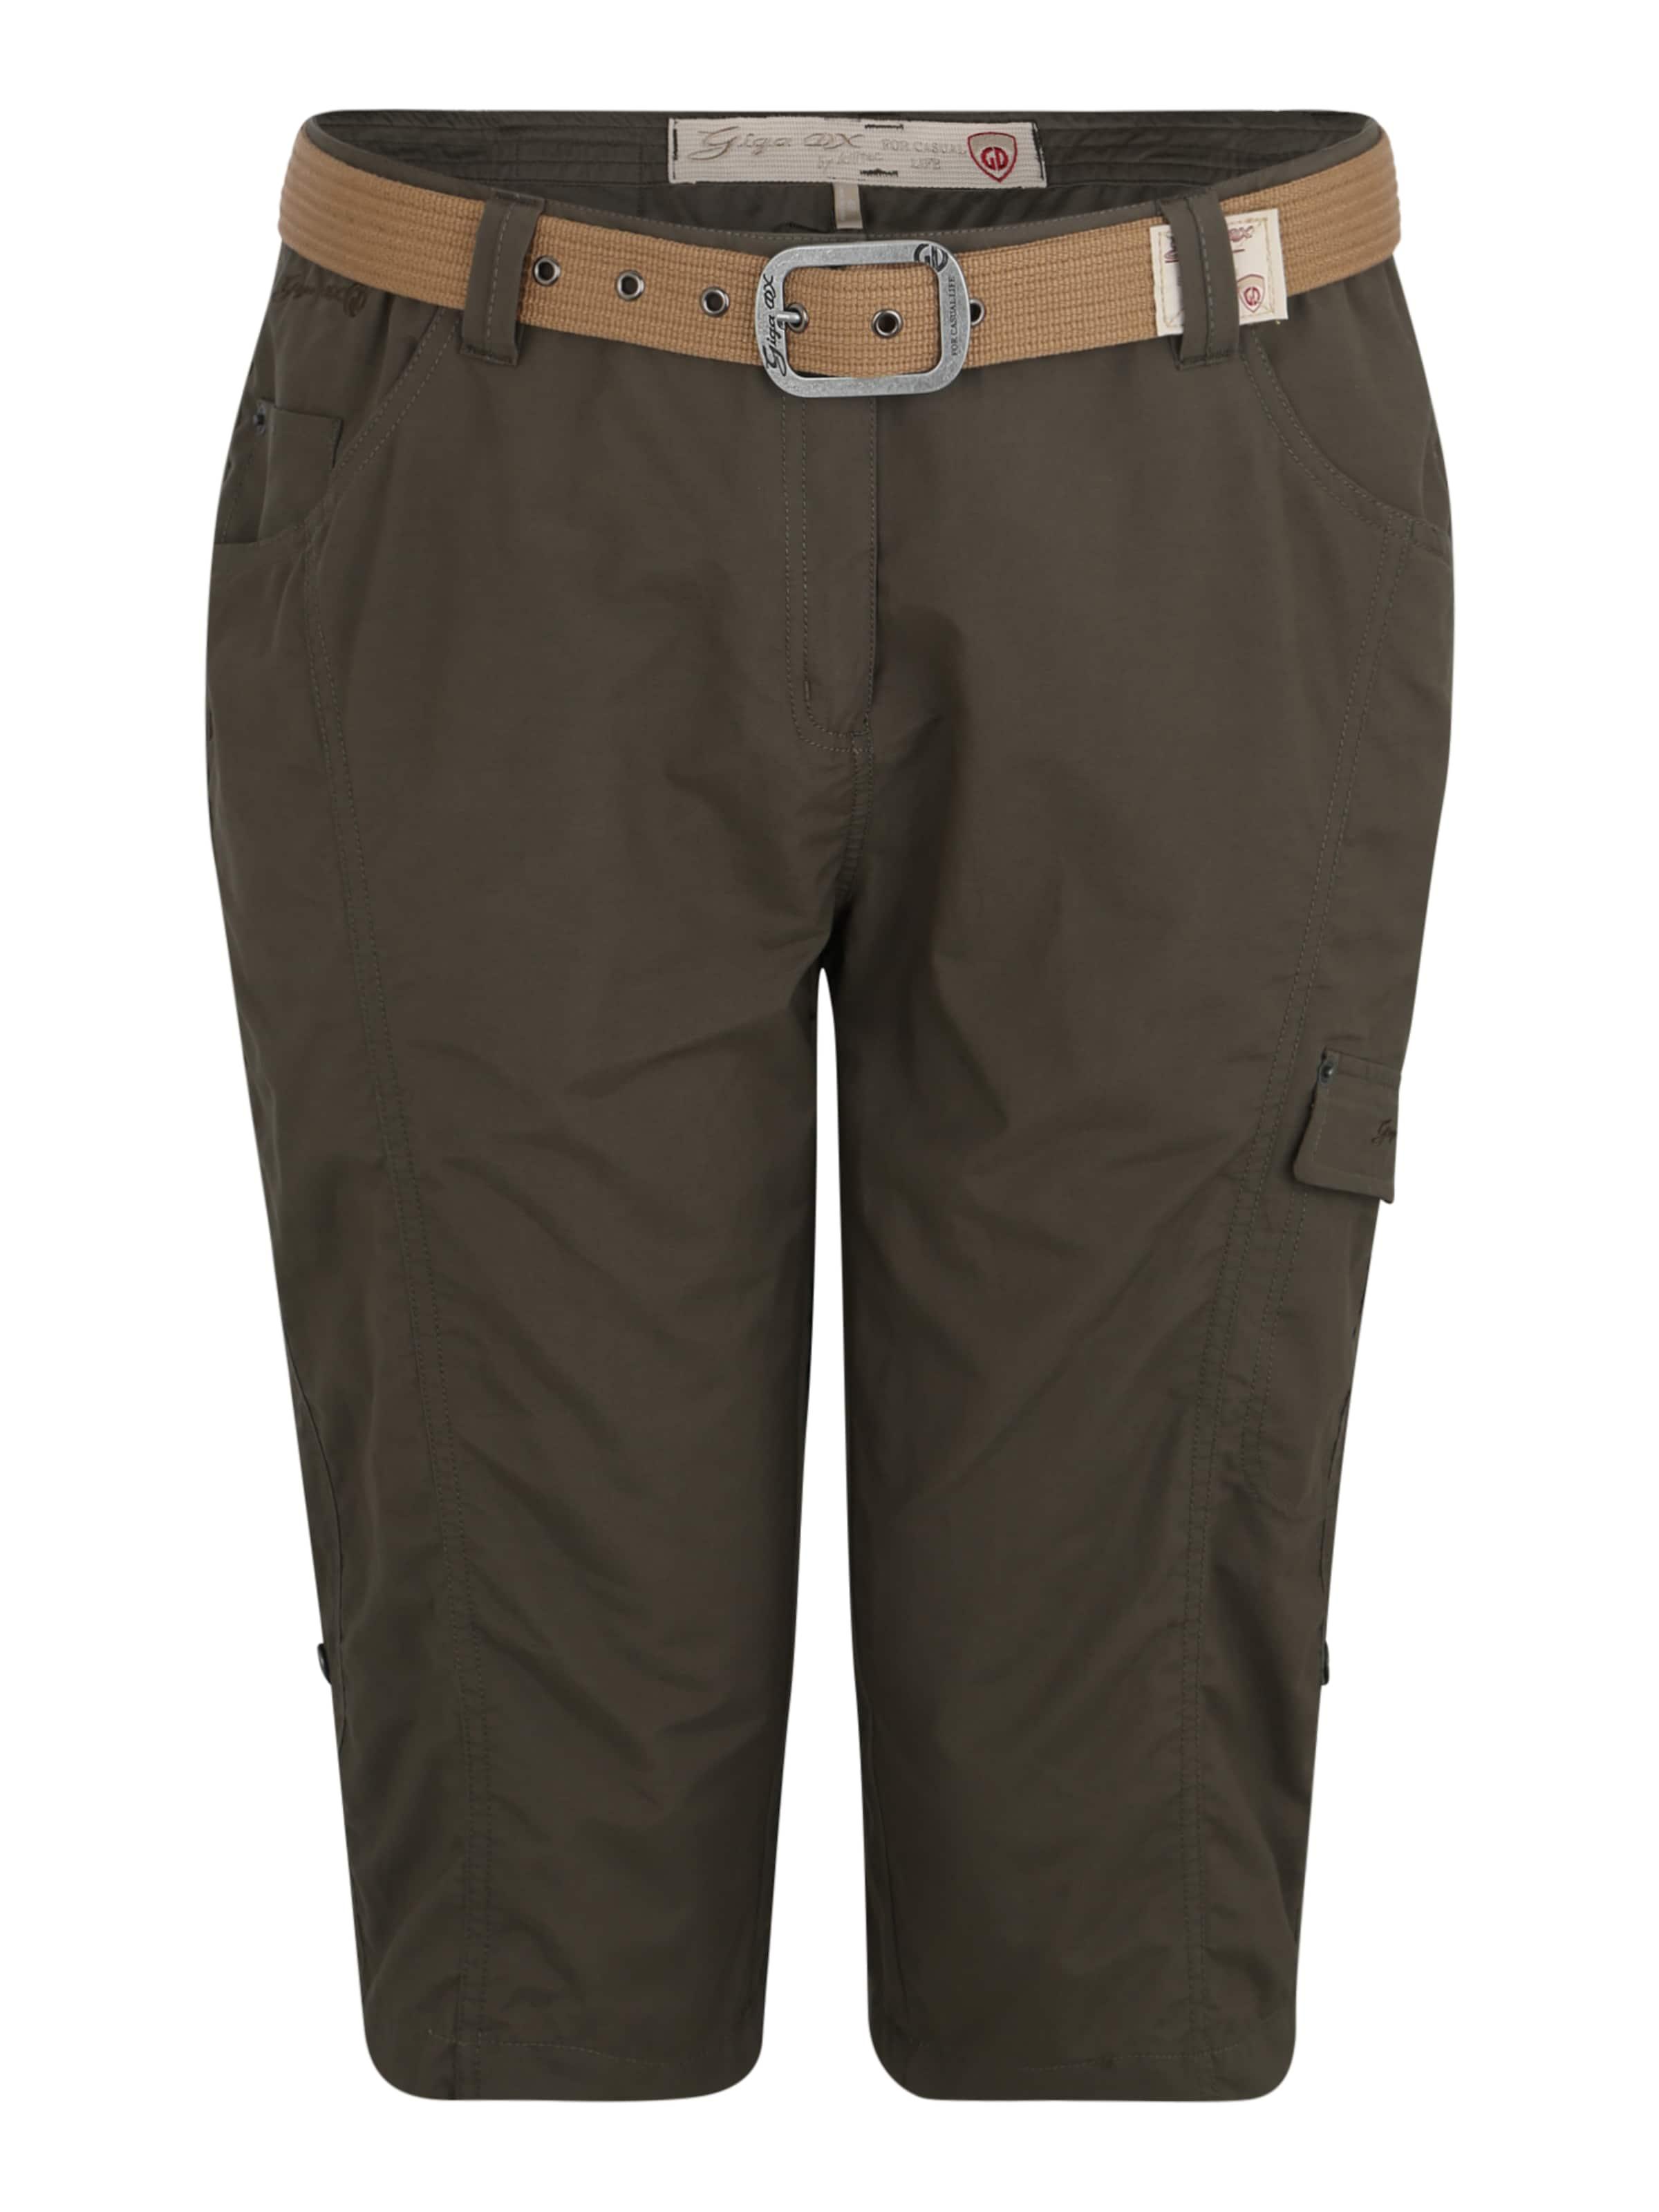 Pantalon g G aDx 'nelika' En Olive i jL34Aq5R